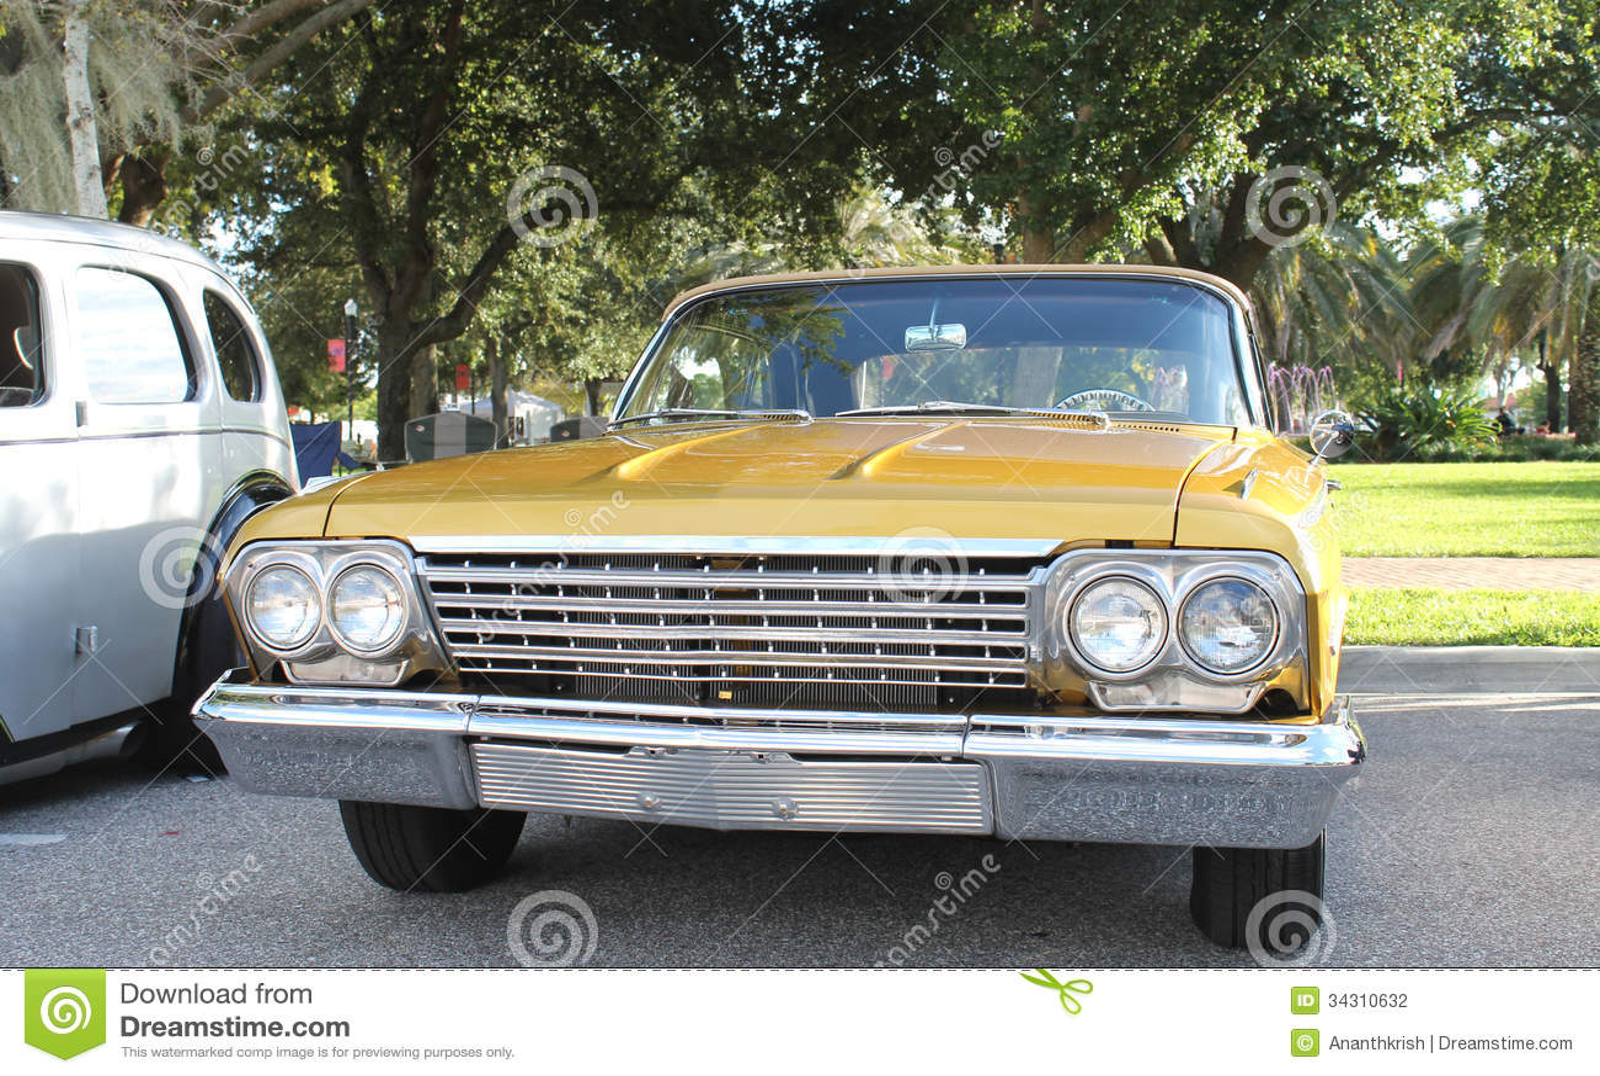 Old Chevrolet Car stock photo. Image of transportation - 34310632